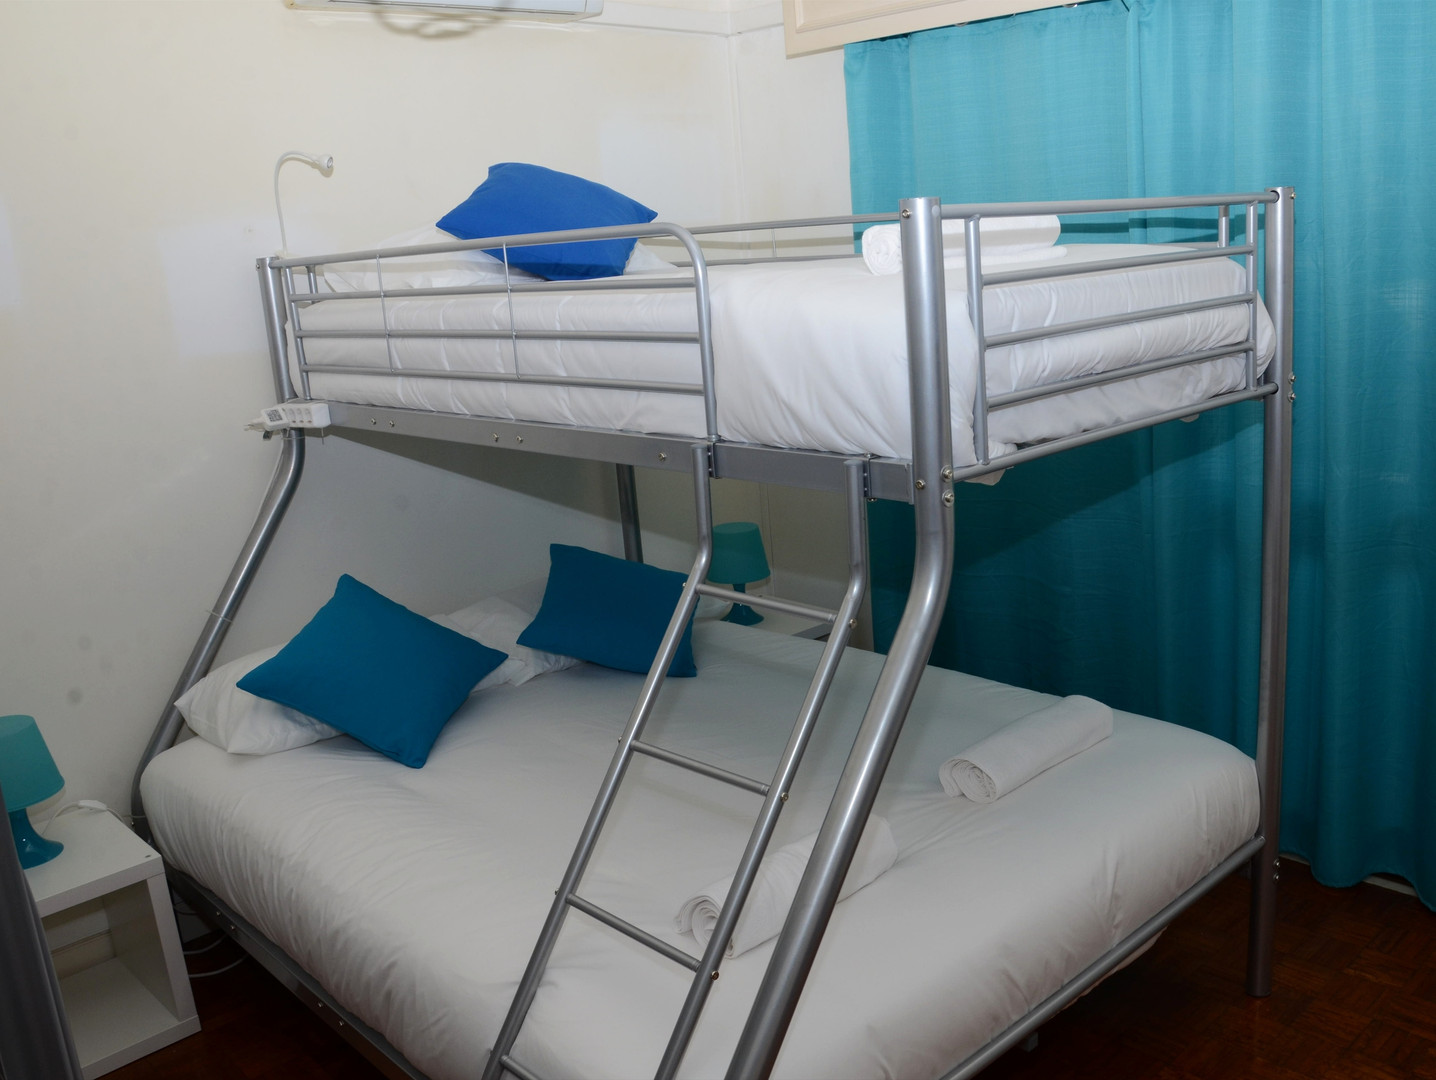 Suite no Hostel em Carcavelos